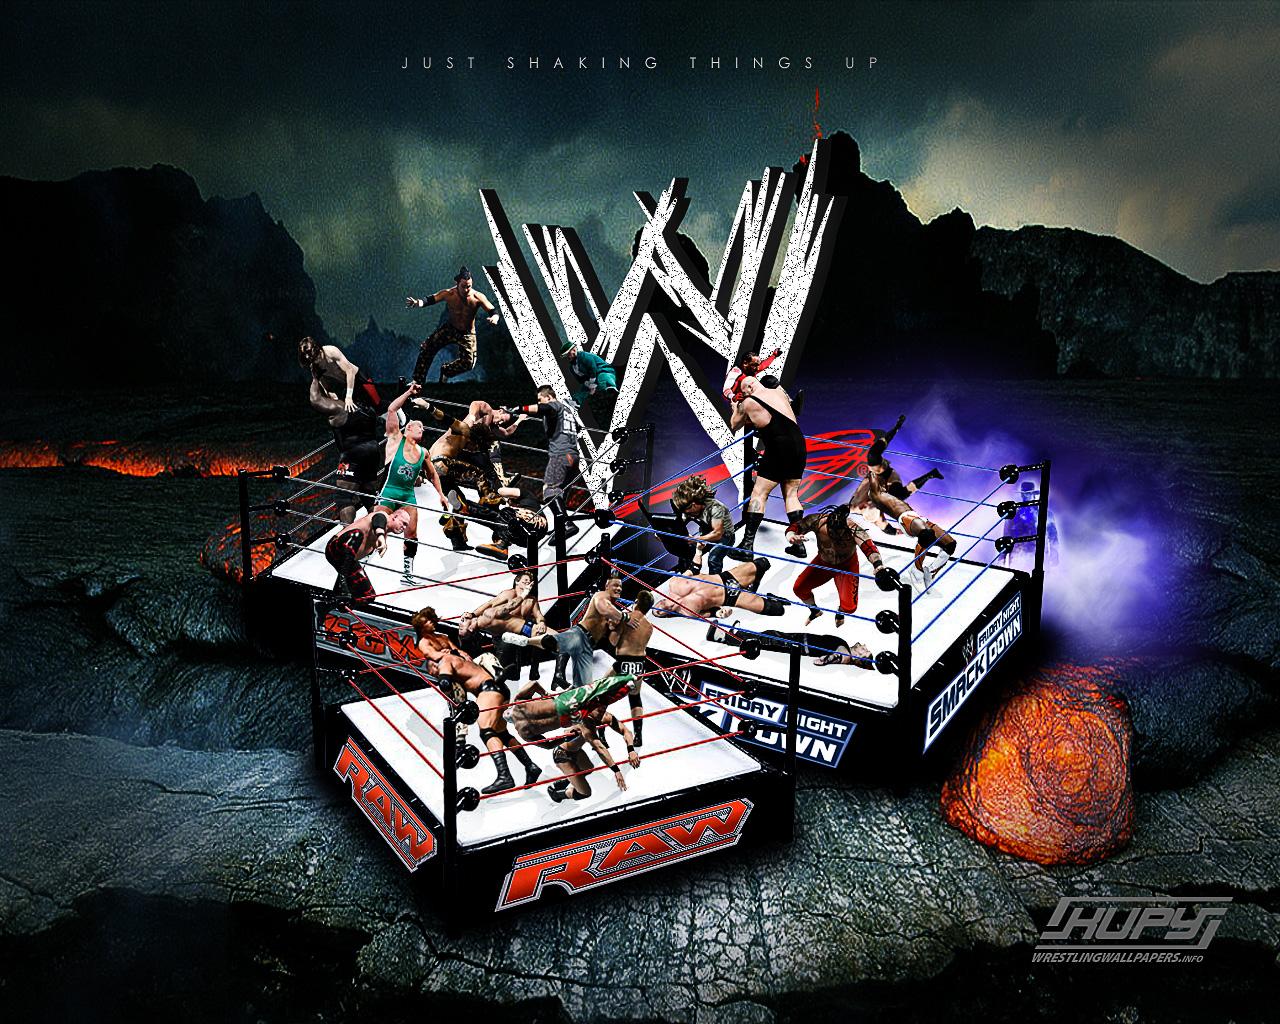 WWE Super Stars Wallpapers HD Nice Wallpapers 1280x1024